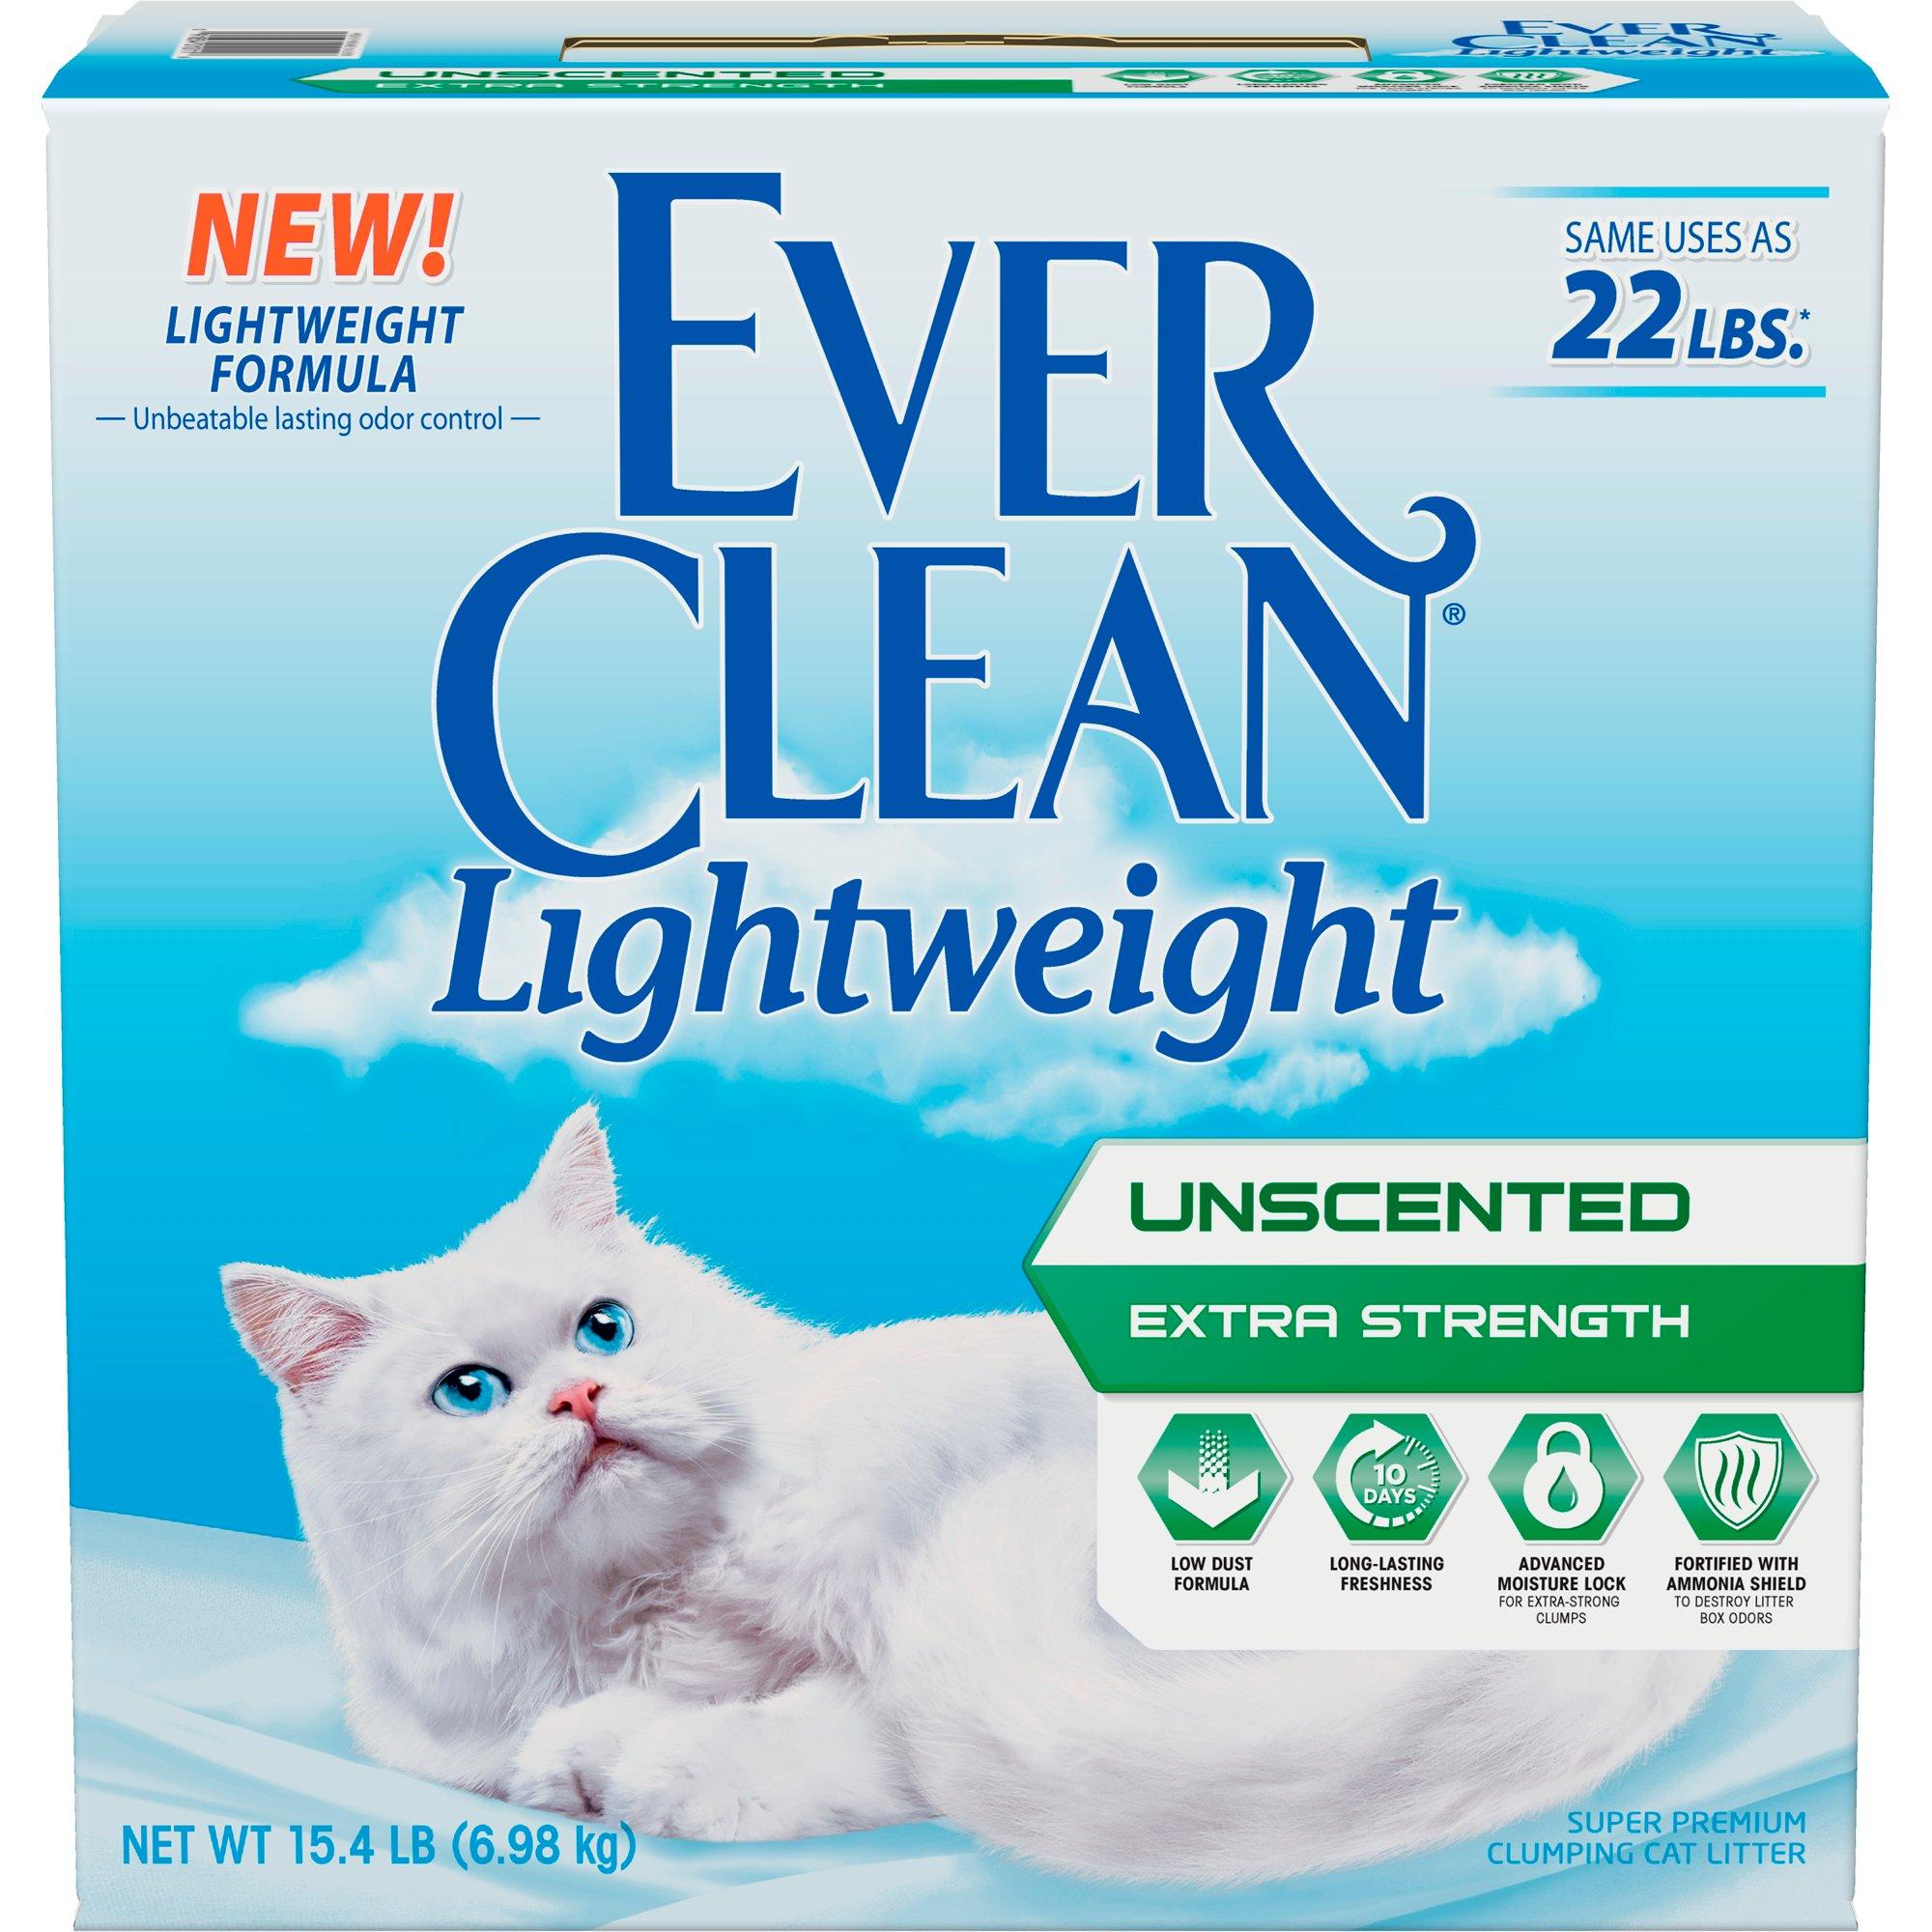 EverClean Lightweight Extra Strength Unscented